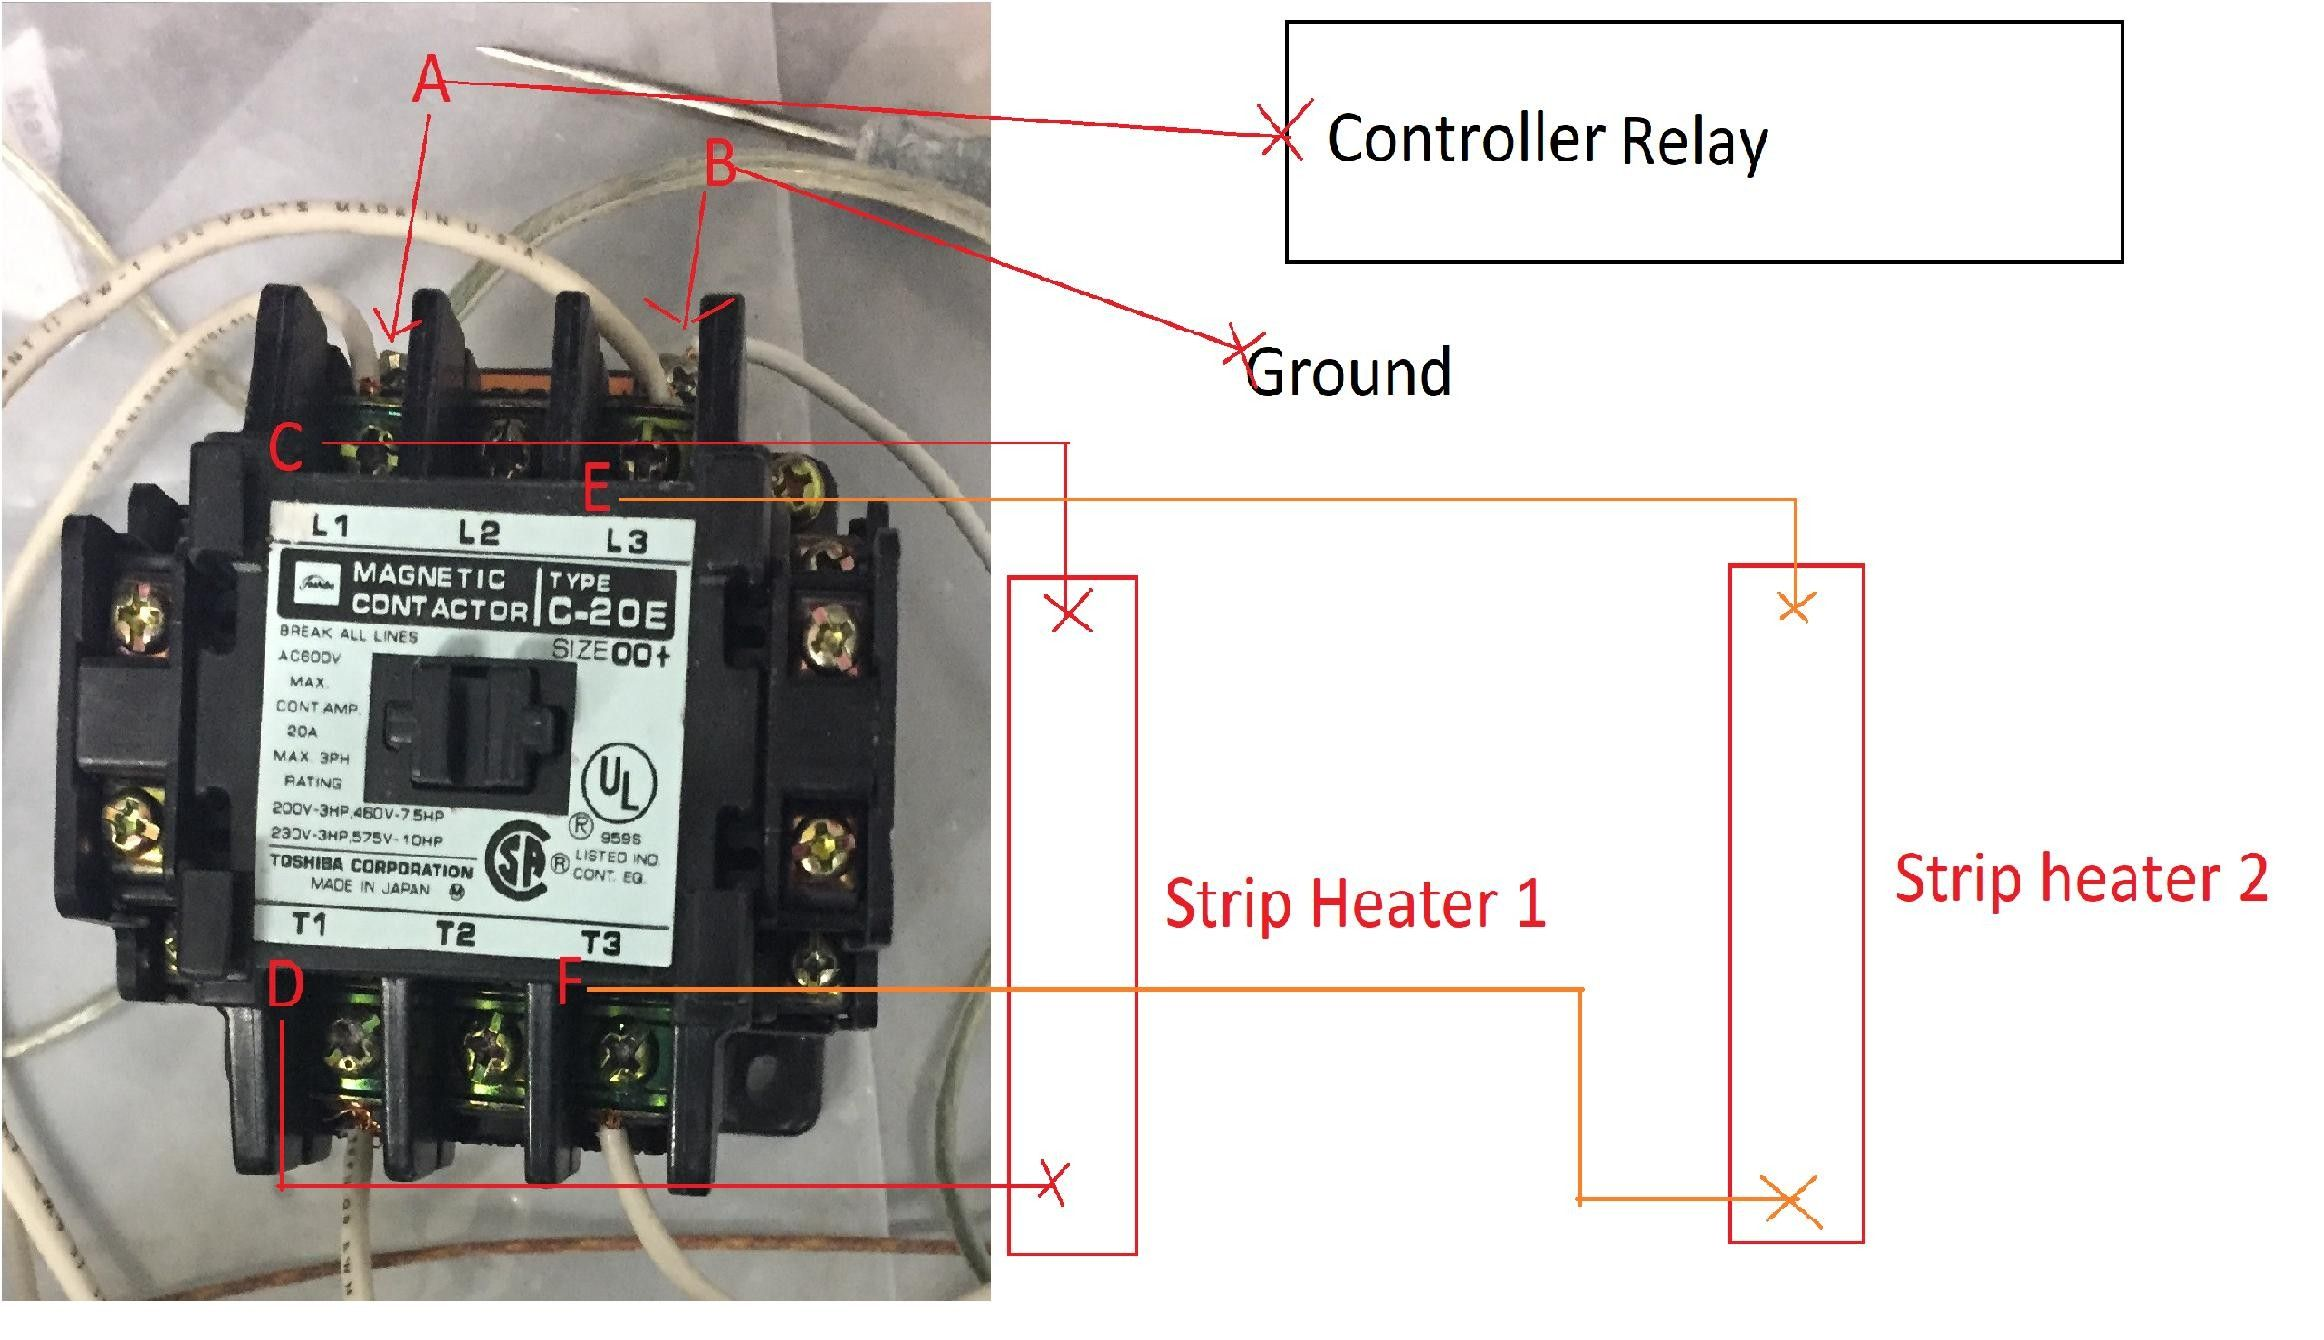 New Imo Contactor Wiring Diagram Diagram Diagramtemplate Diagramsample